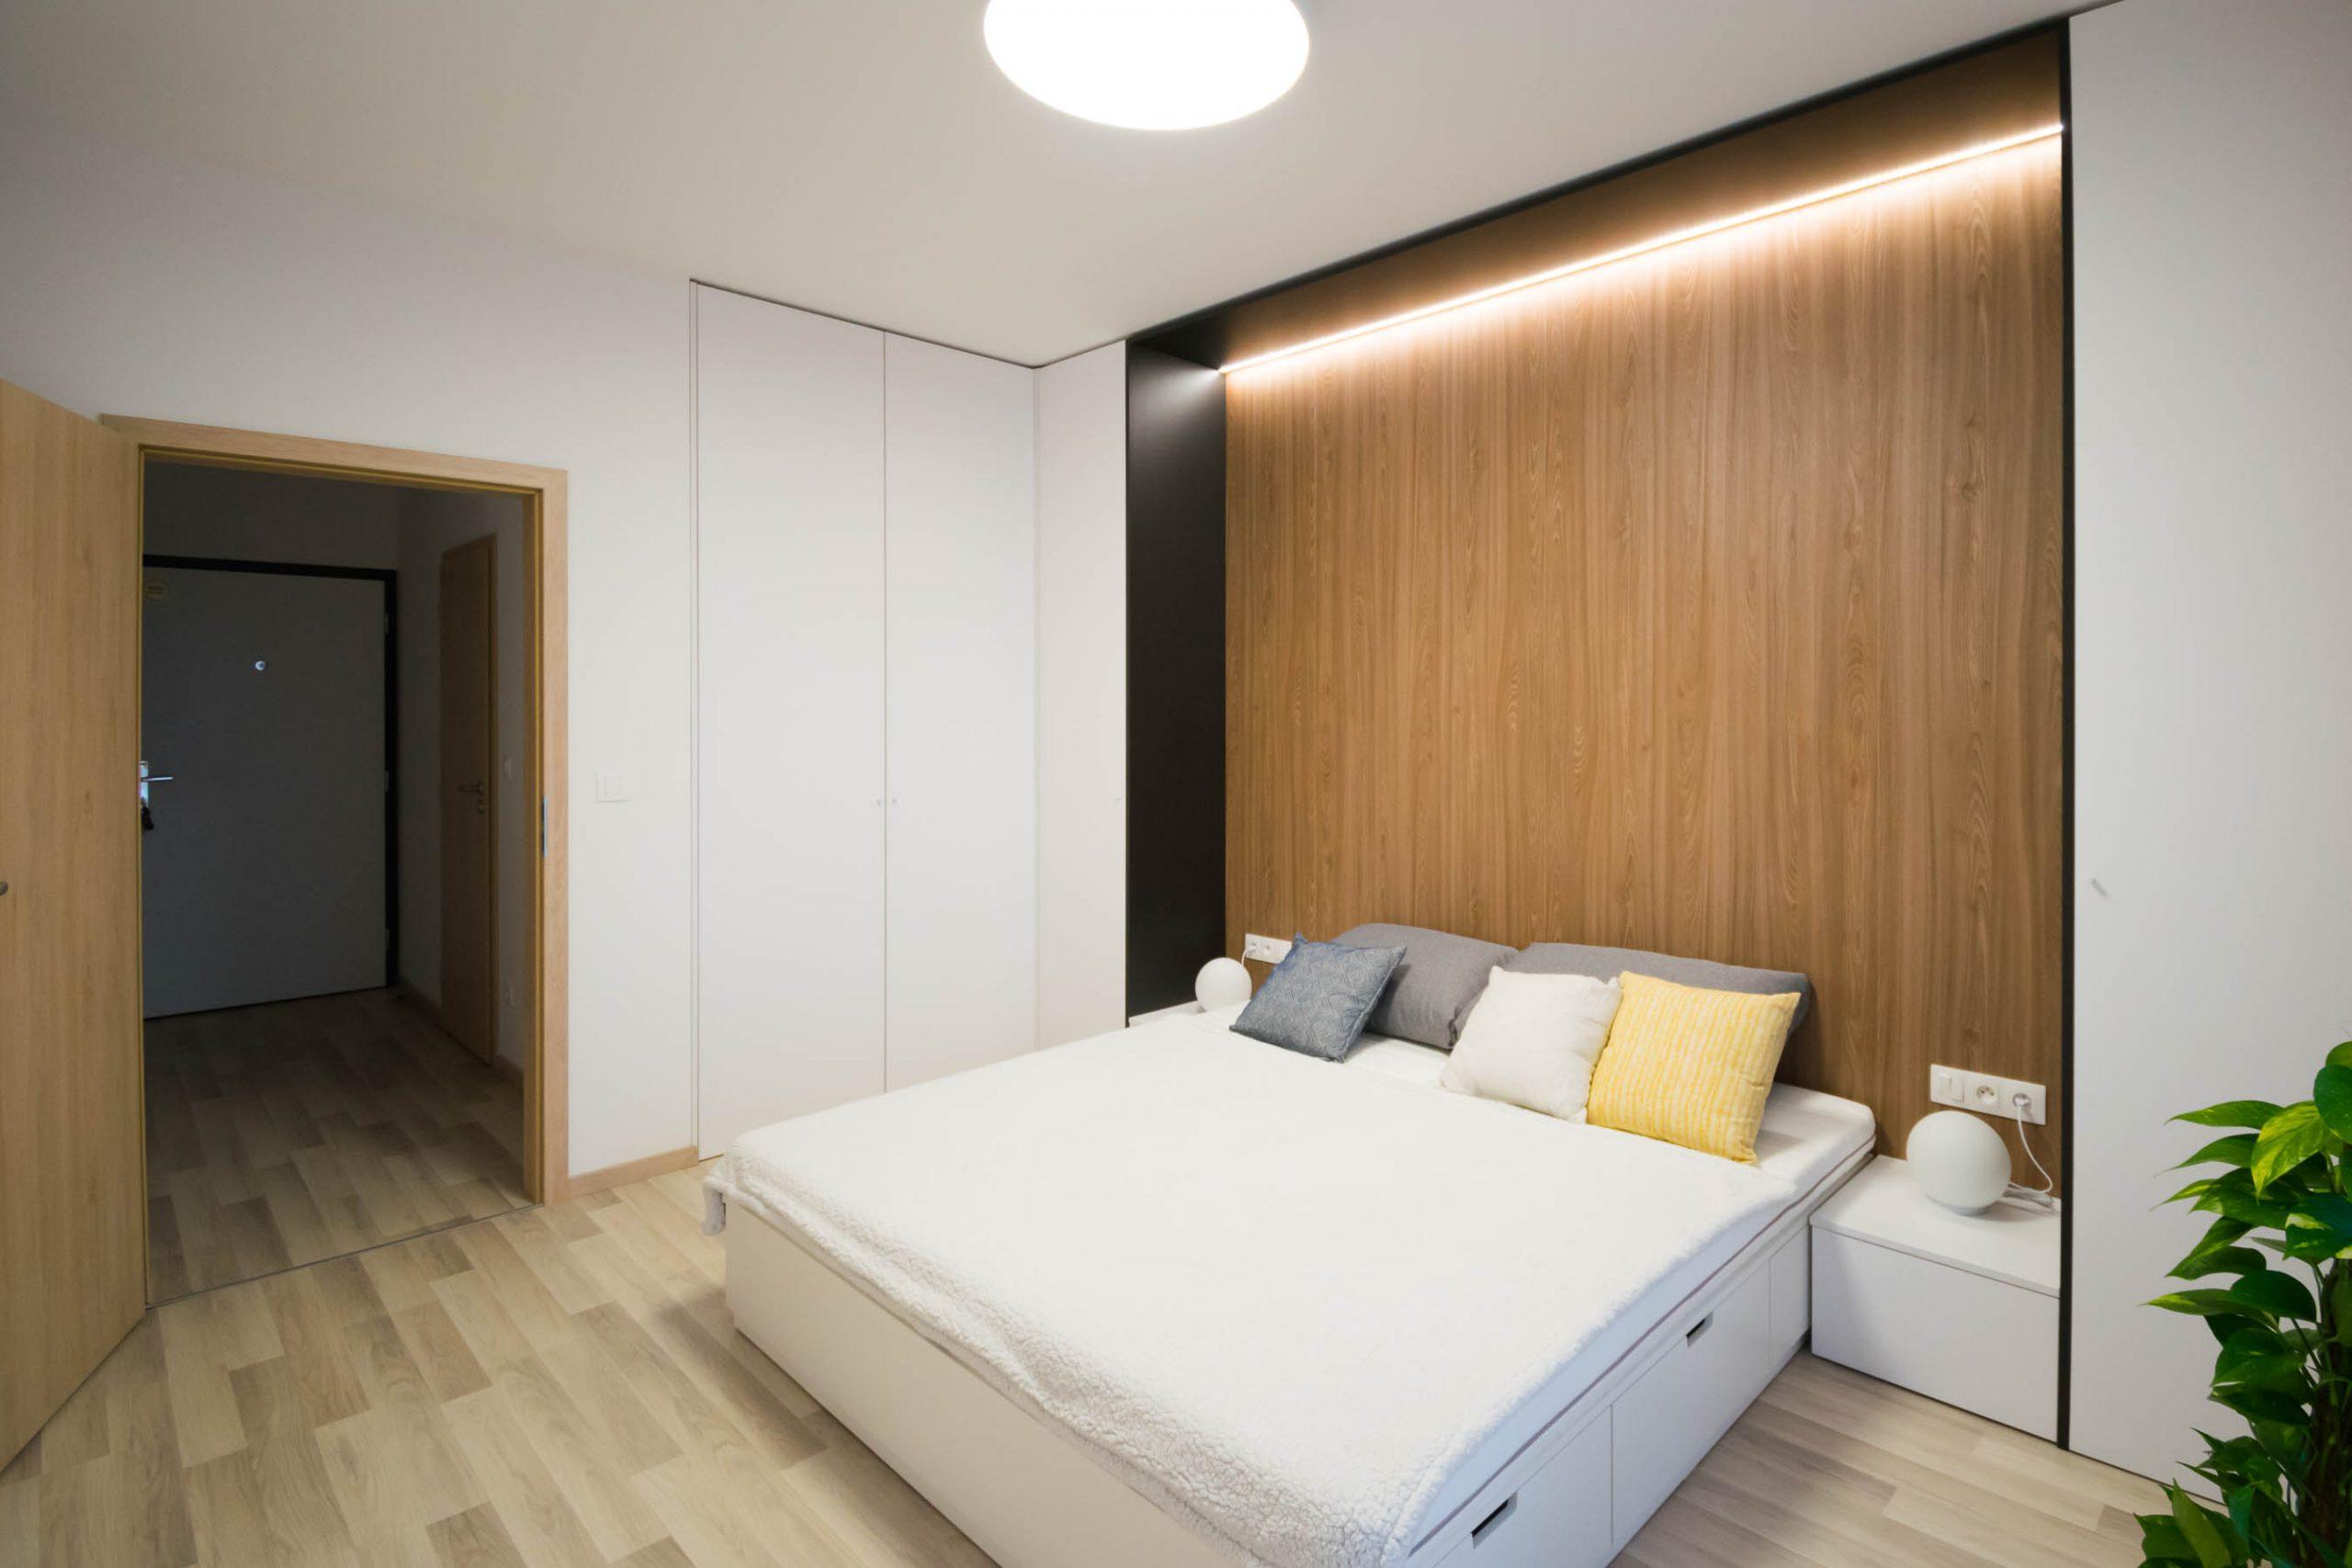 Interiér nájomného bytu, Bratislava, spálňa, VAUarchitects